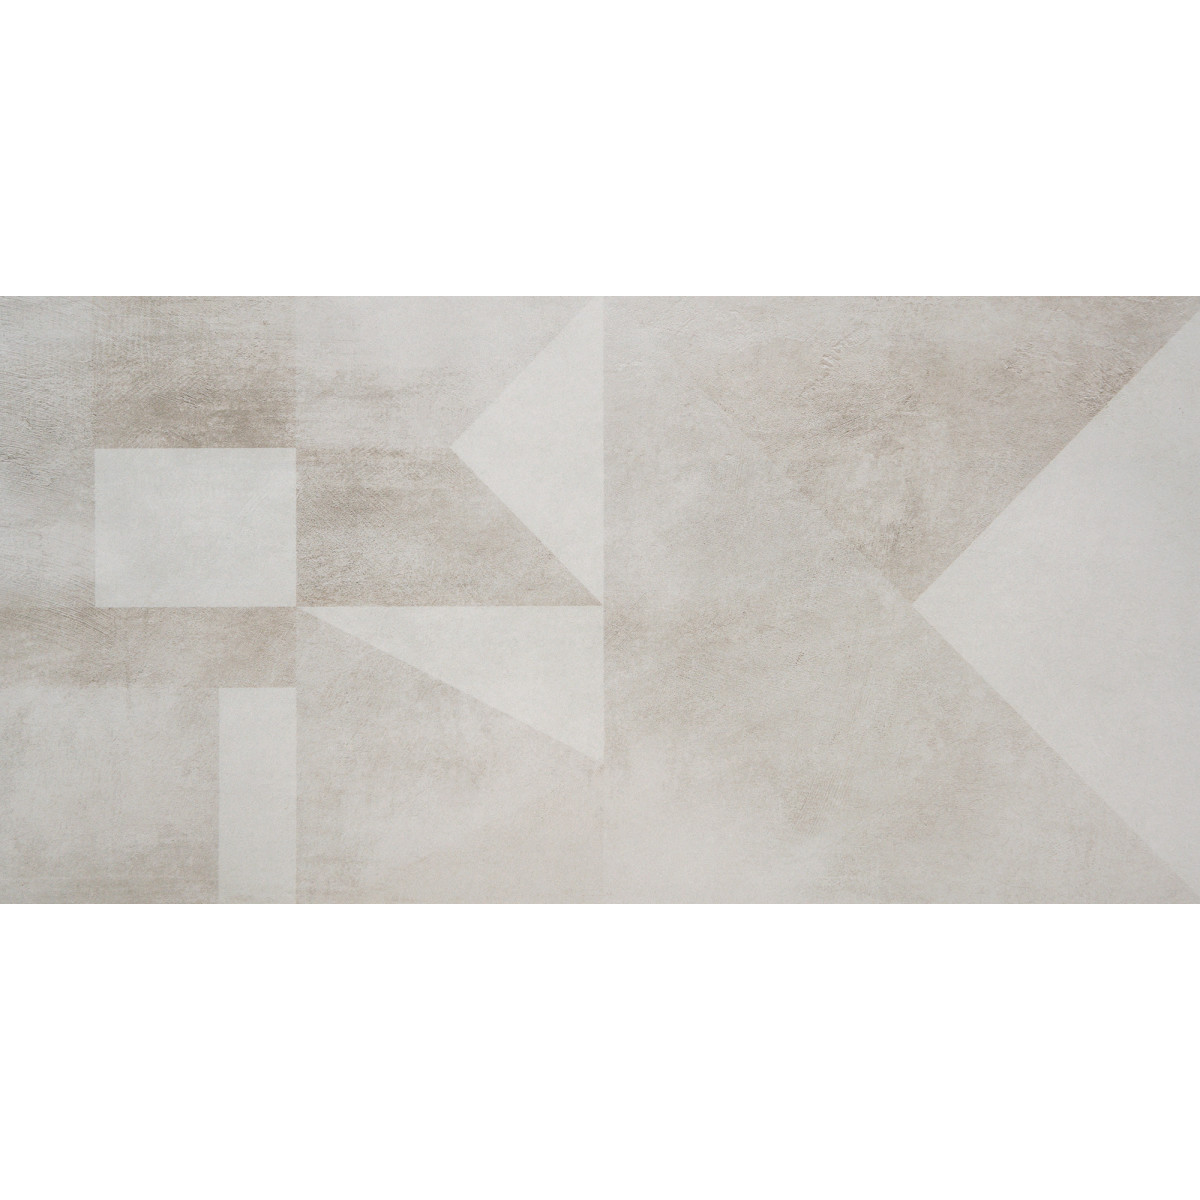 Керамогранит «Iceberg Multi» 30x60 144 М² Цвет Серый